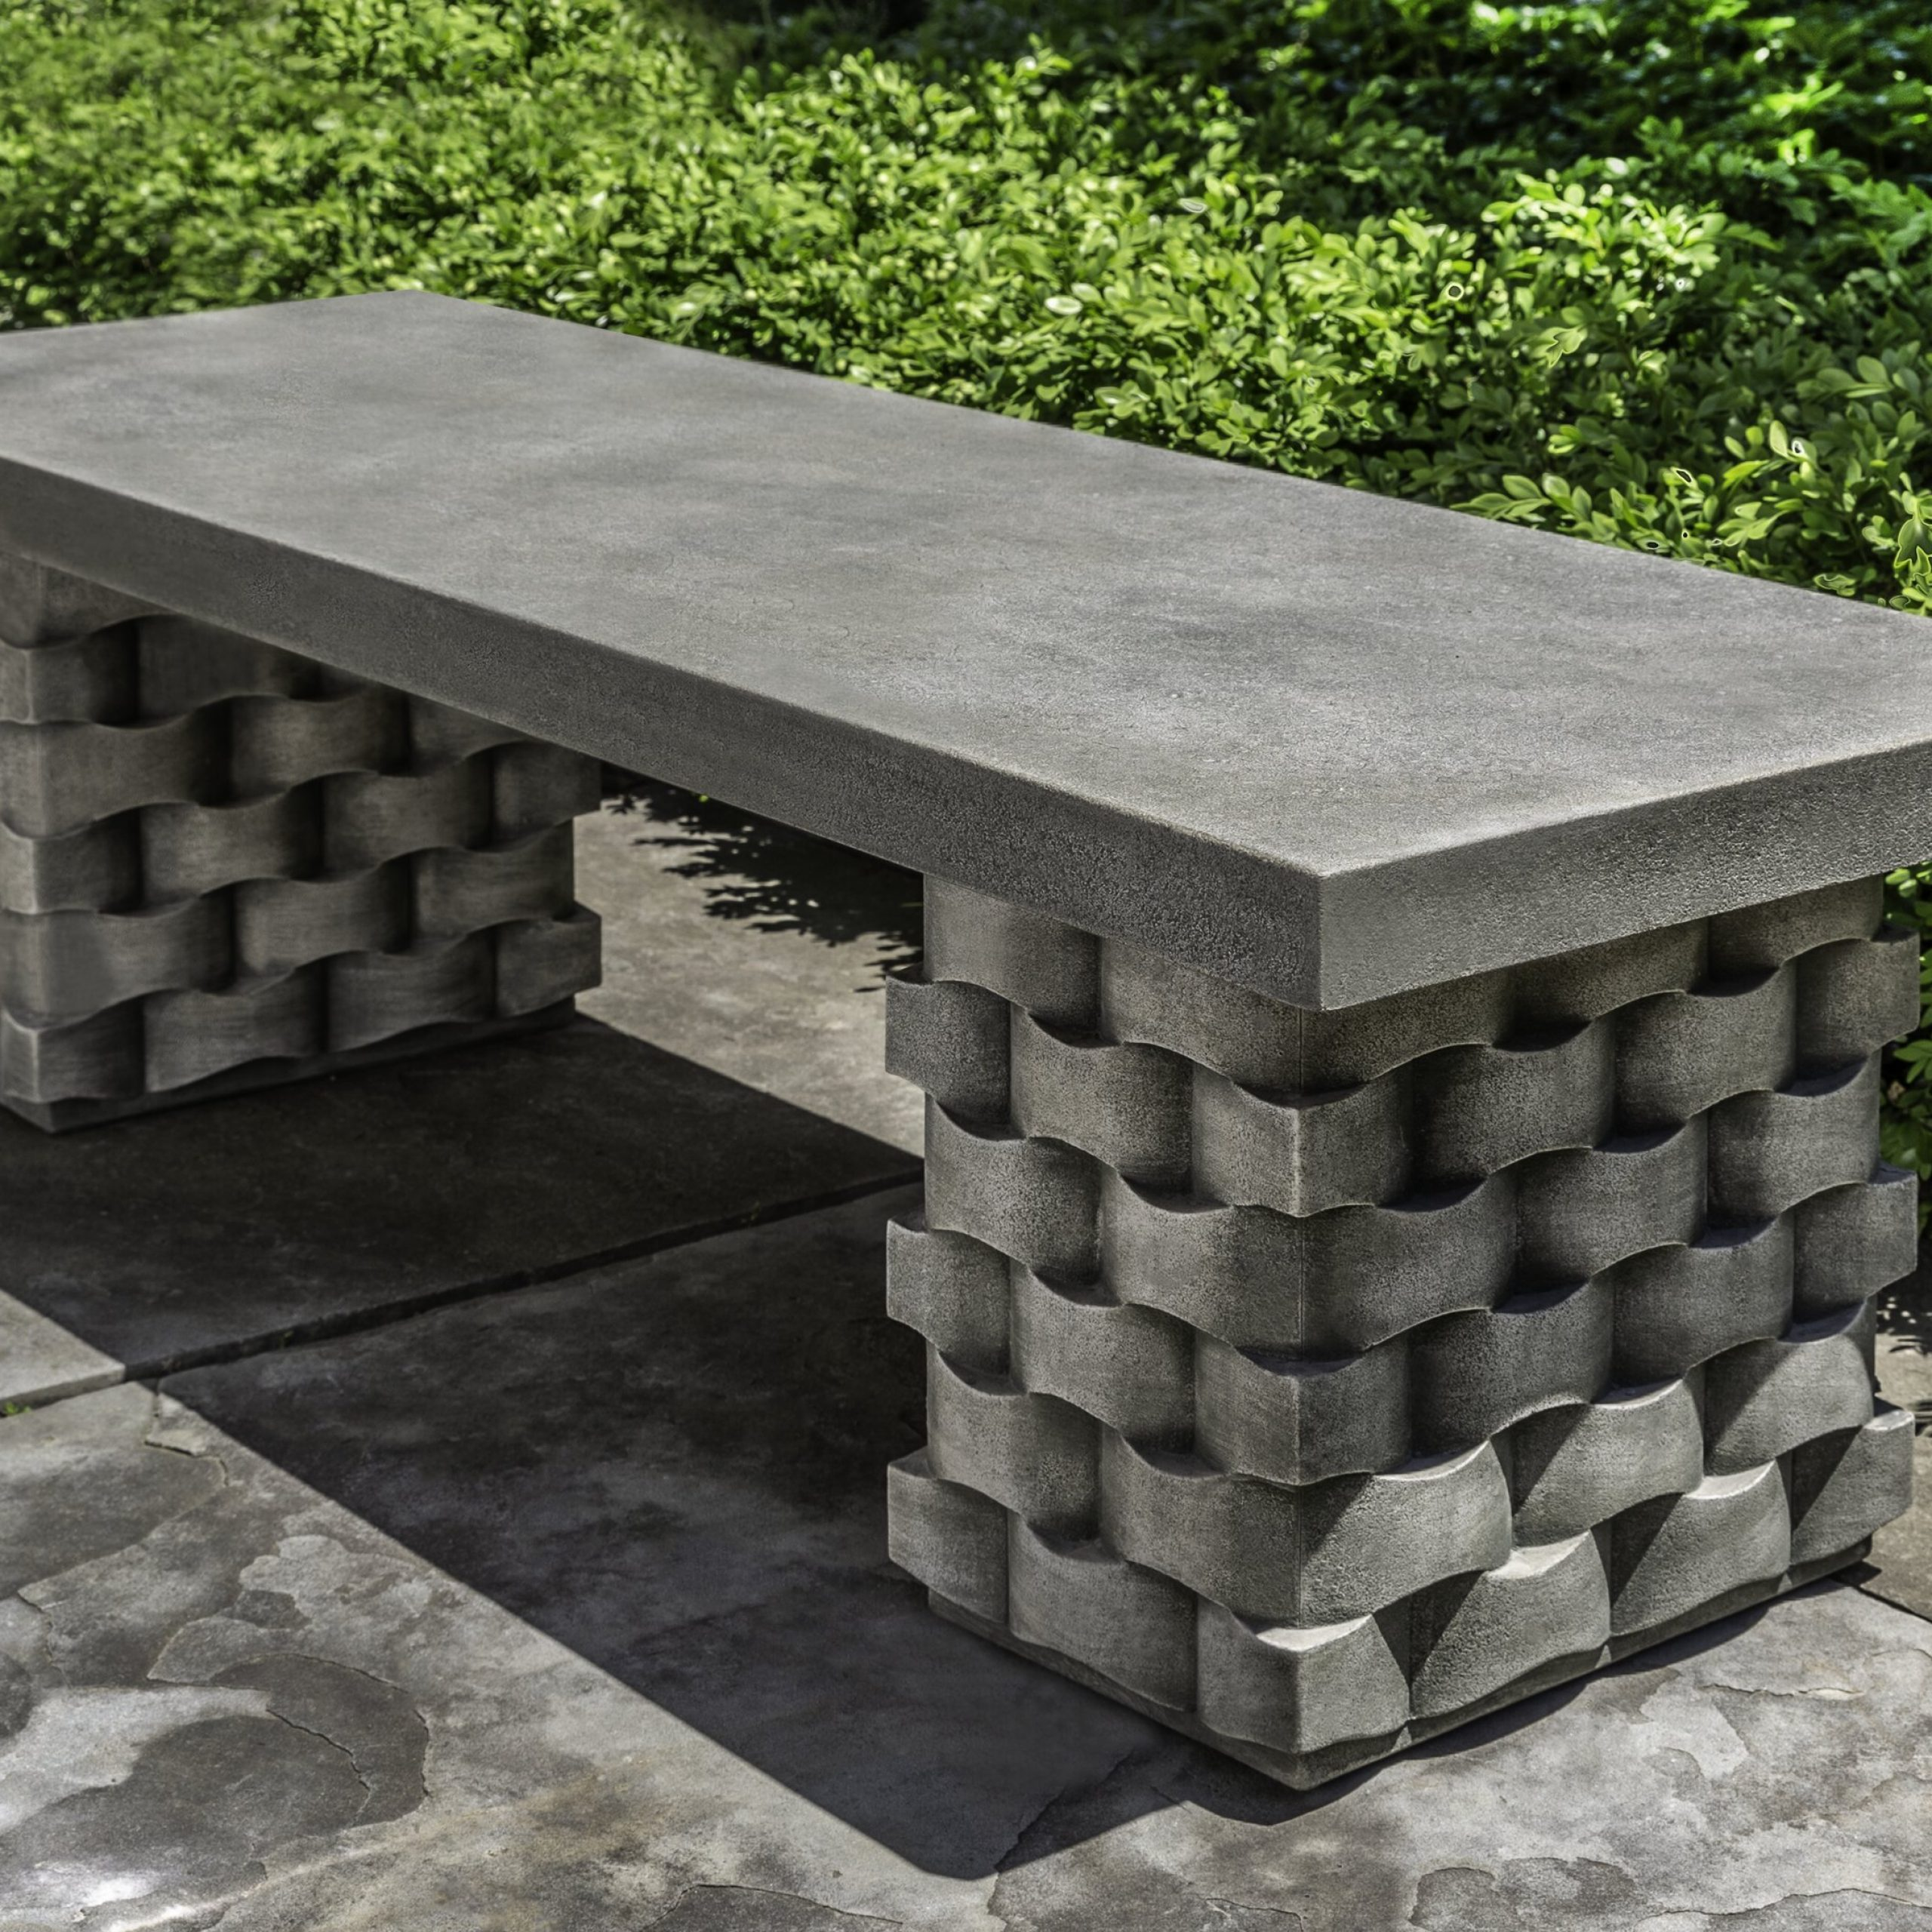 Elsner Acacia Garden Benches With Regard To Famous August Grove Anaya Stone Garden Bench (View 27 of 30)